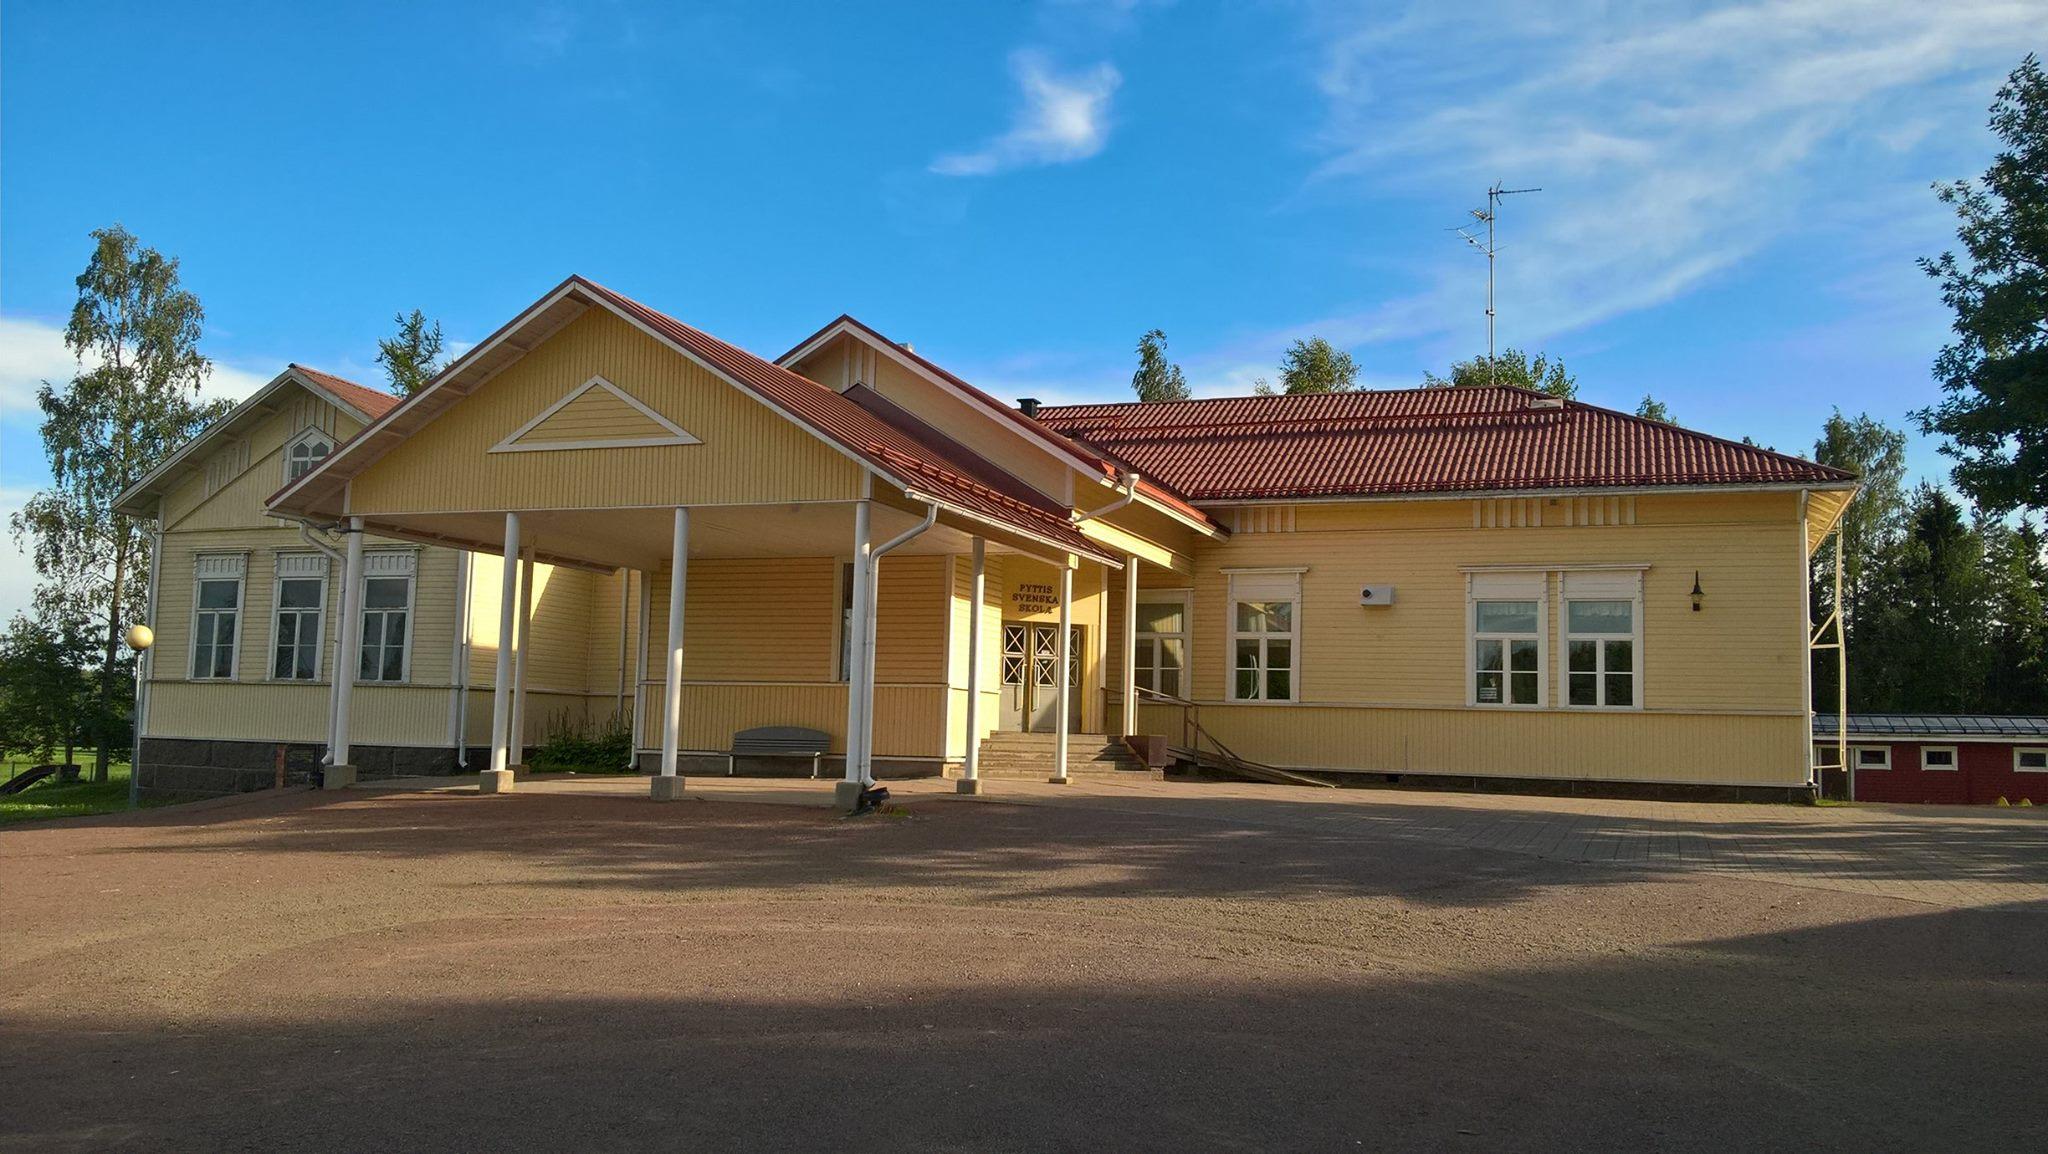 Pyttis skola